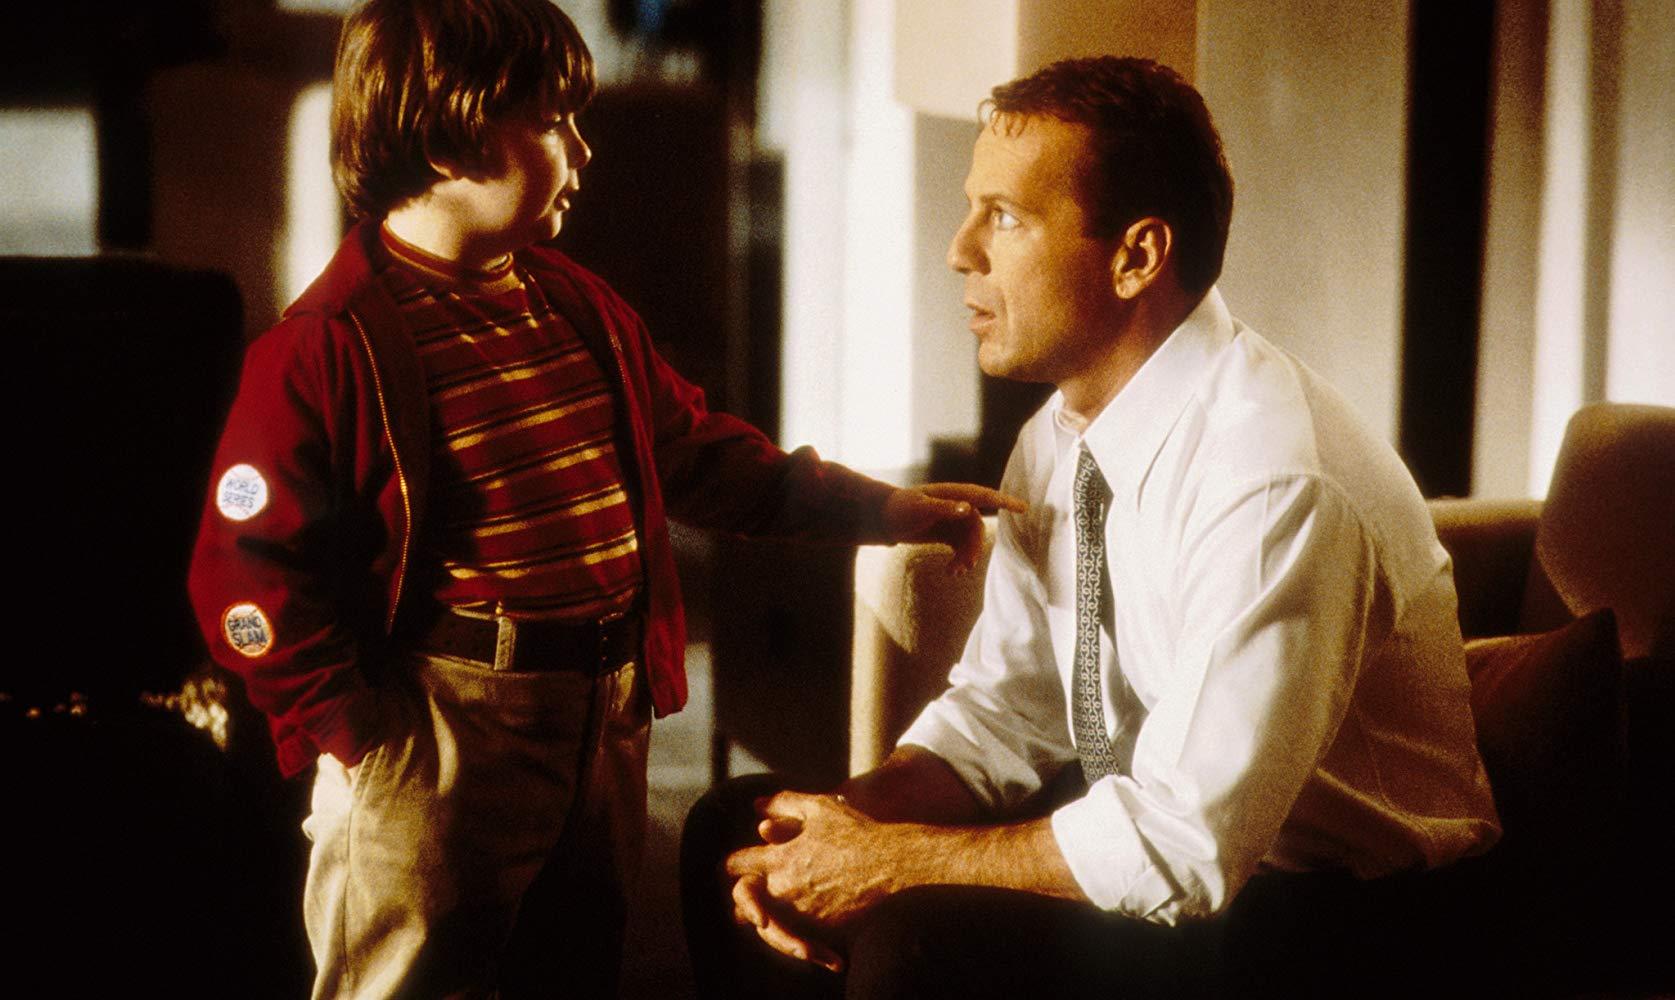 Bruce Willis meets his boyhood self Spencer Breslin in The Kid (2000)